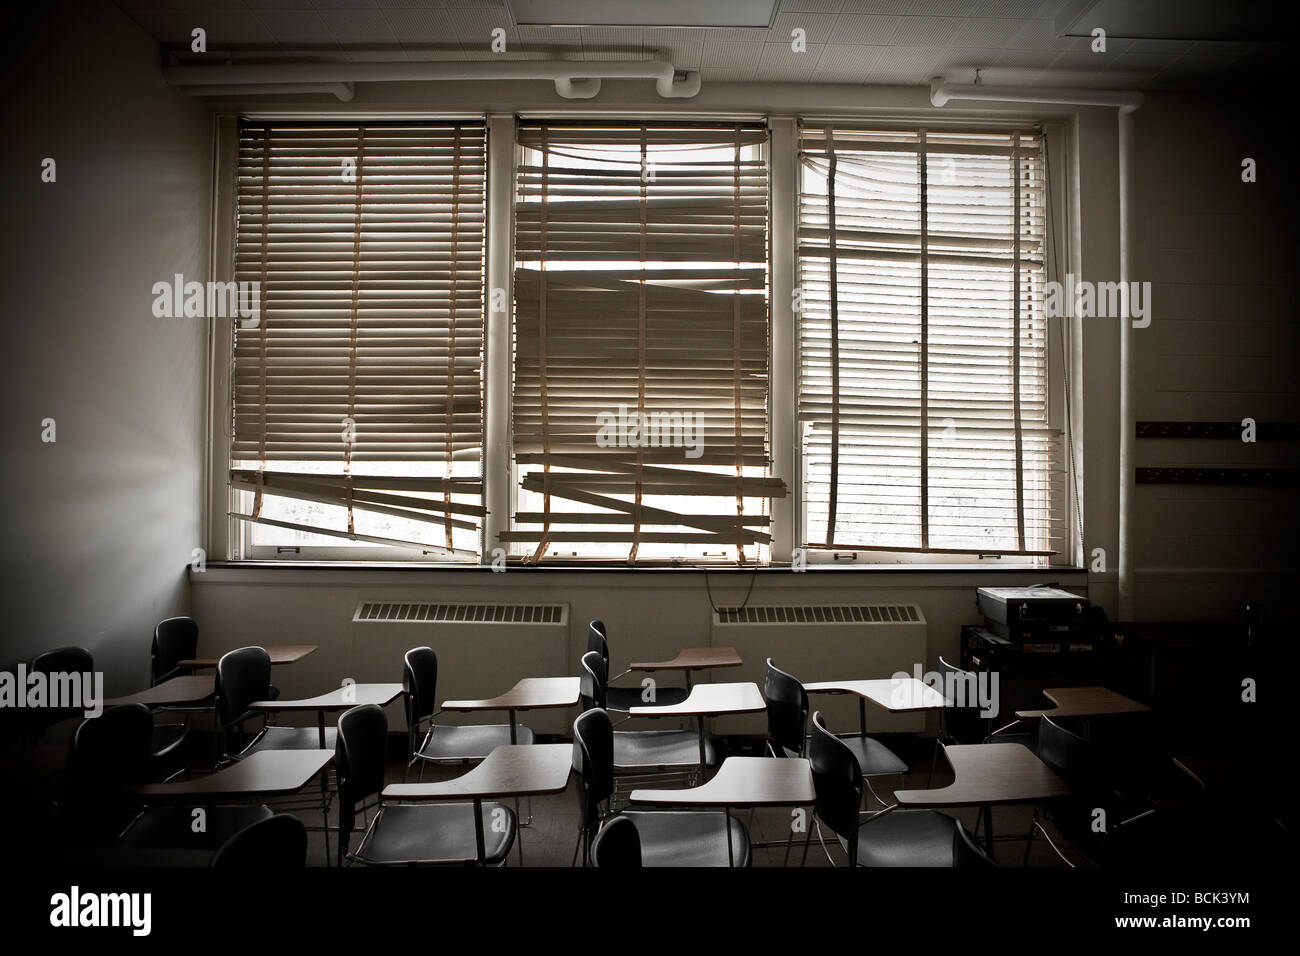 Classroom window - Old Classroom With Broken Window Blinds Stock Photo